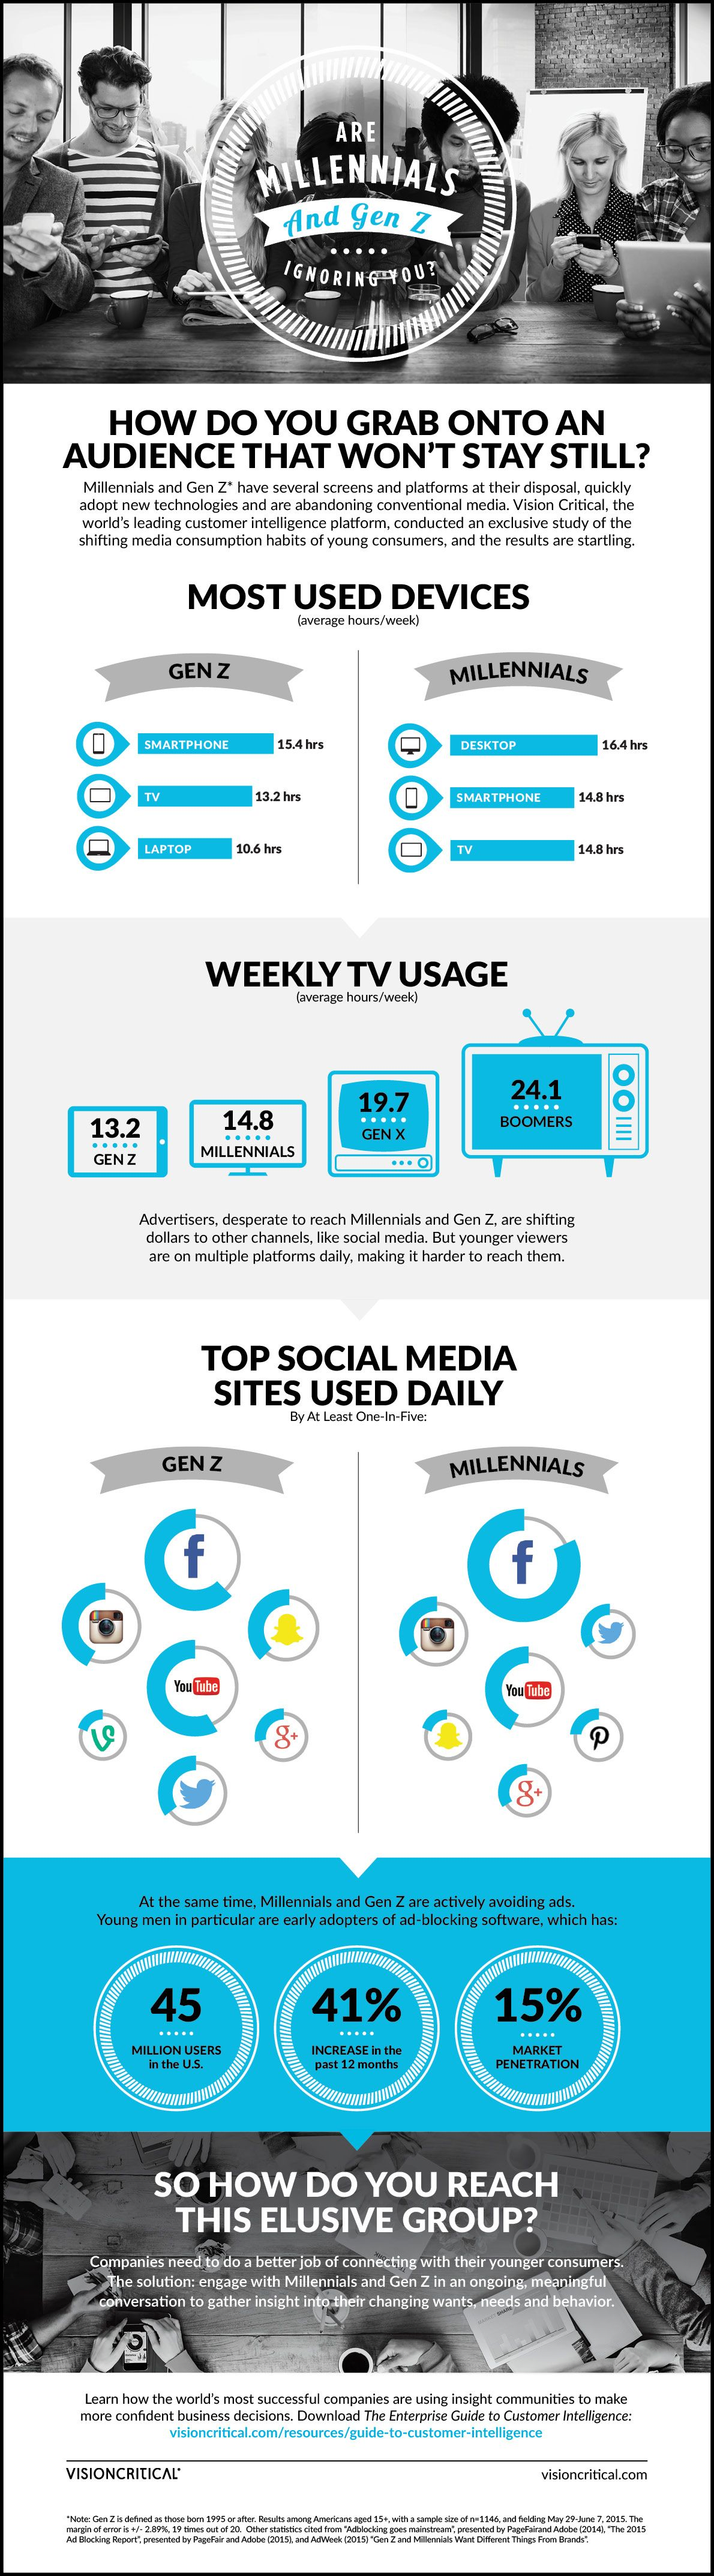 Generation Z Characteristics 5 Infographics On The Gen Z Lifestyle Generation Z Digital Marketing Design Customer Insight